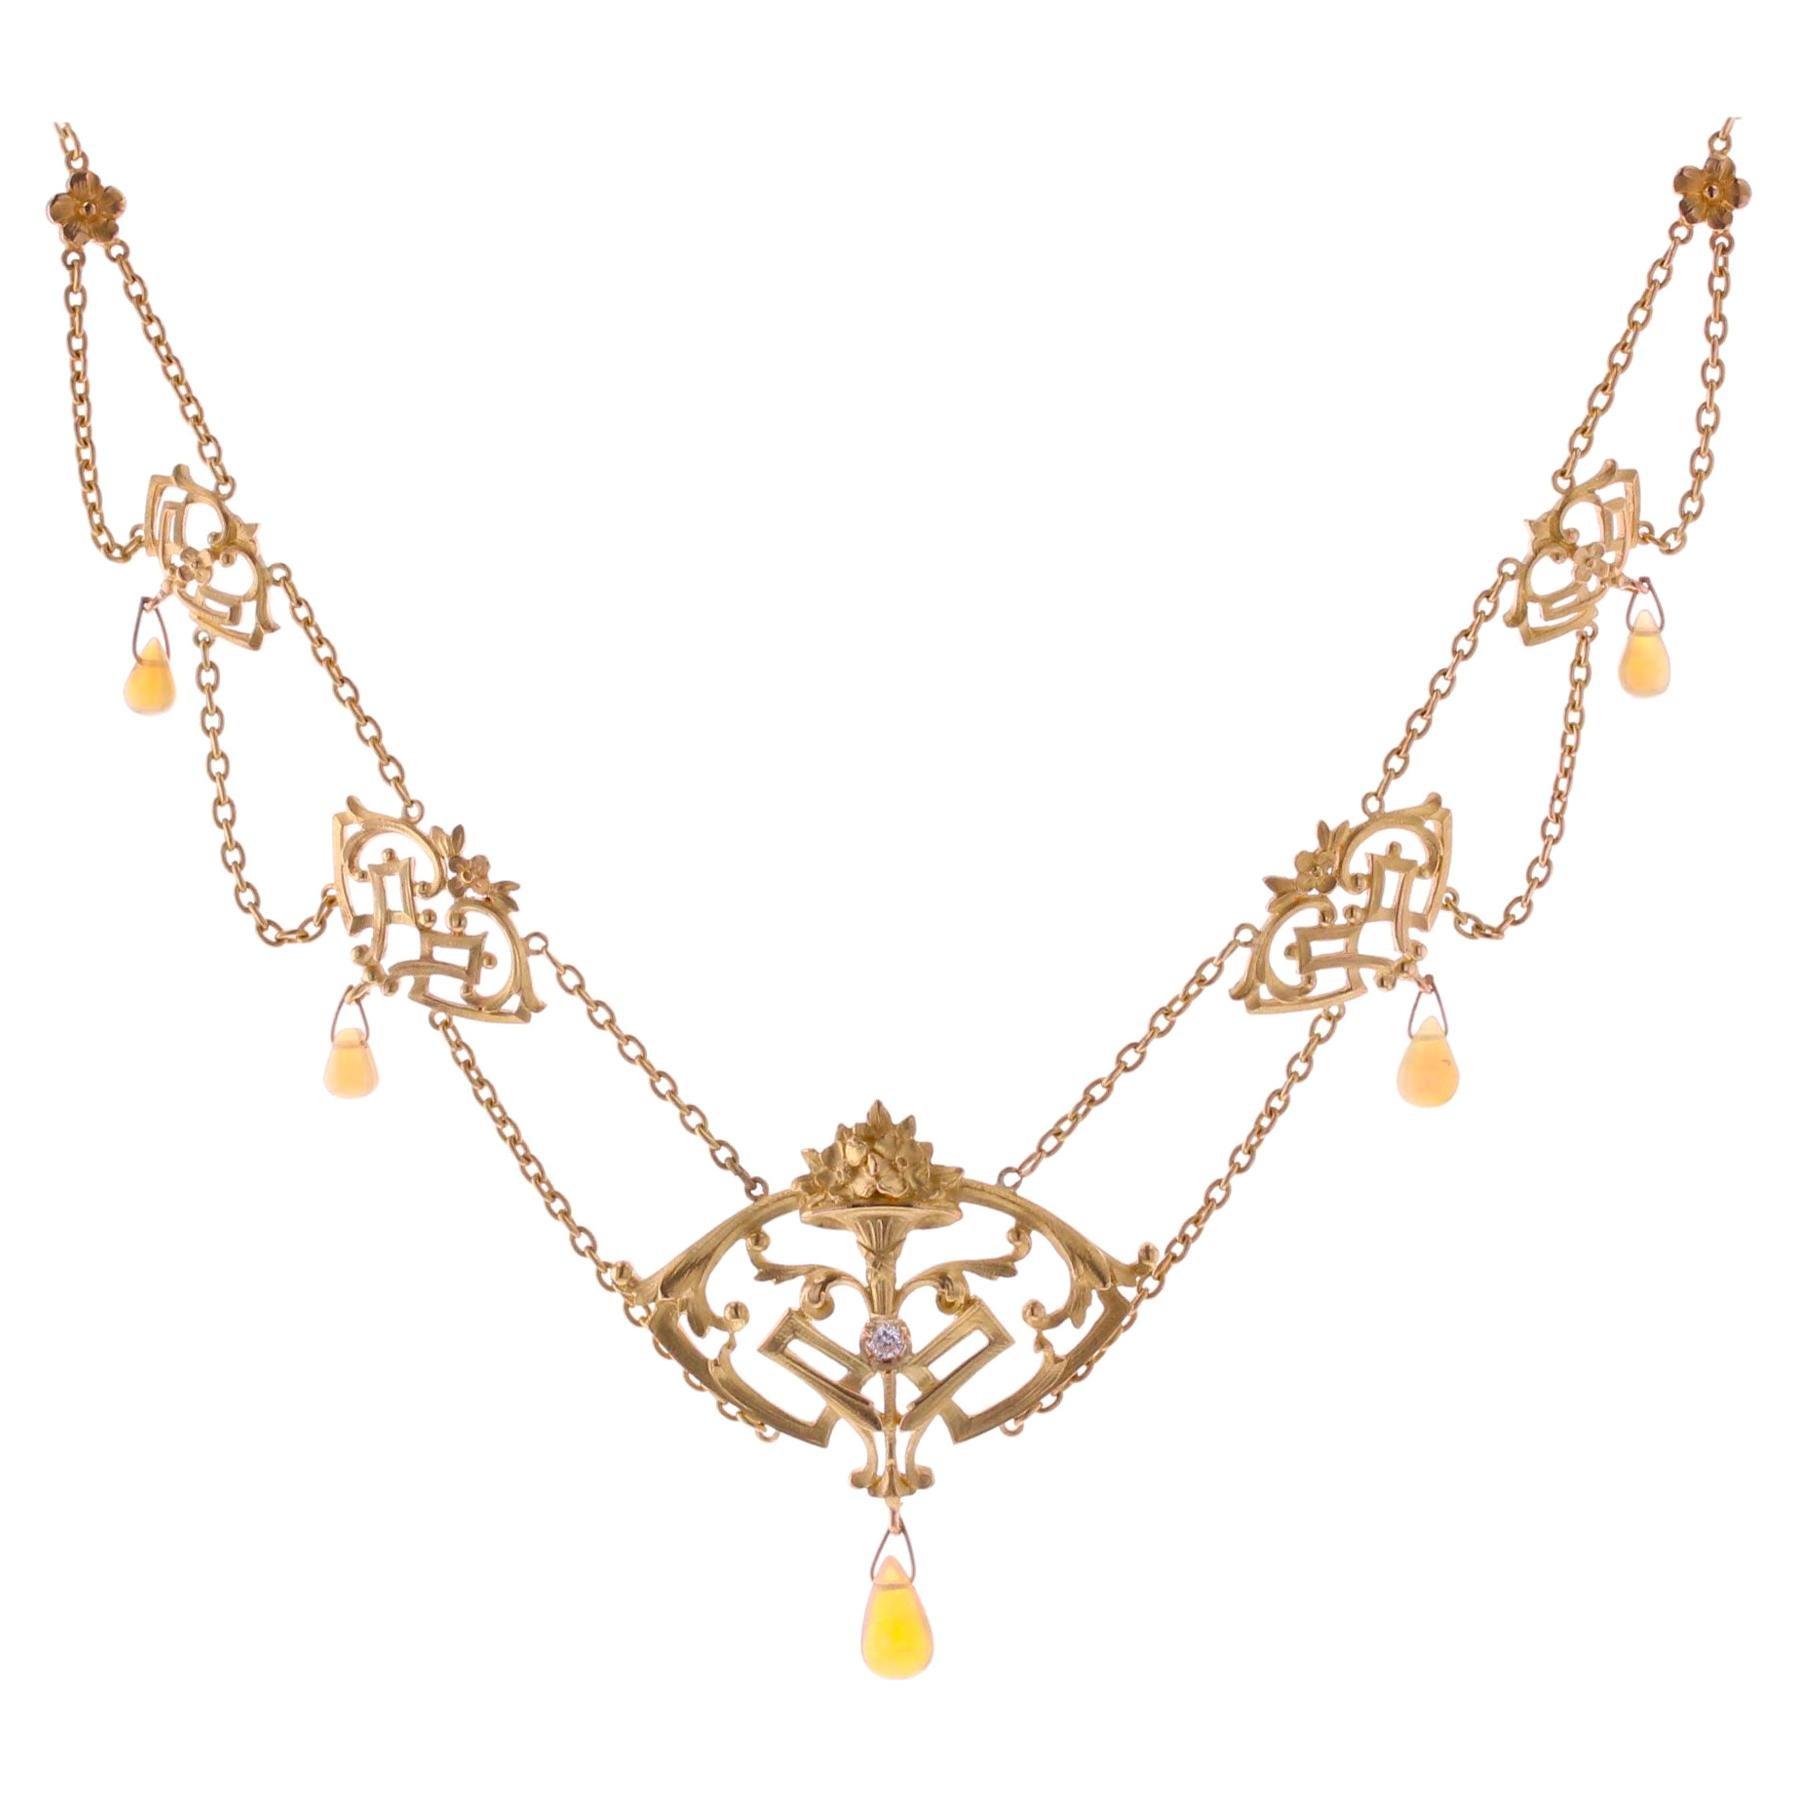 French 1890s Art Nouveau Opal Diamond 18 Karat Yellow Gold Necklace